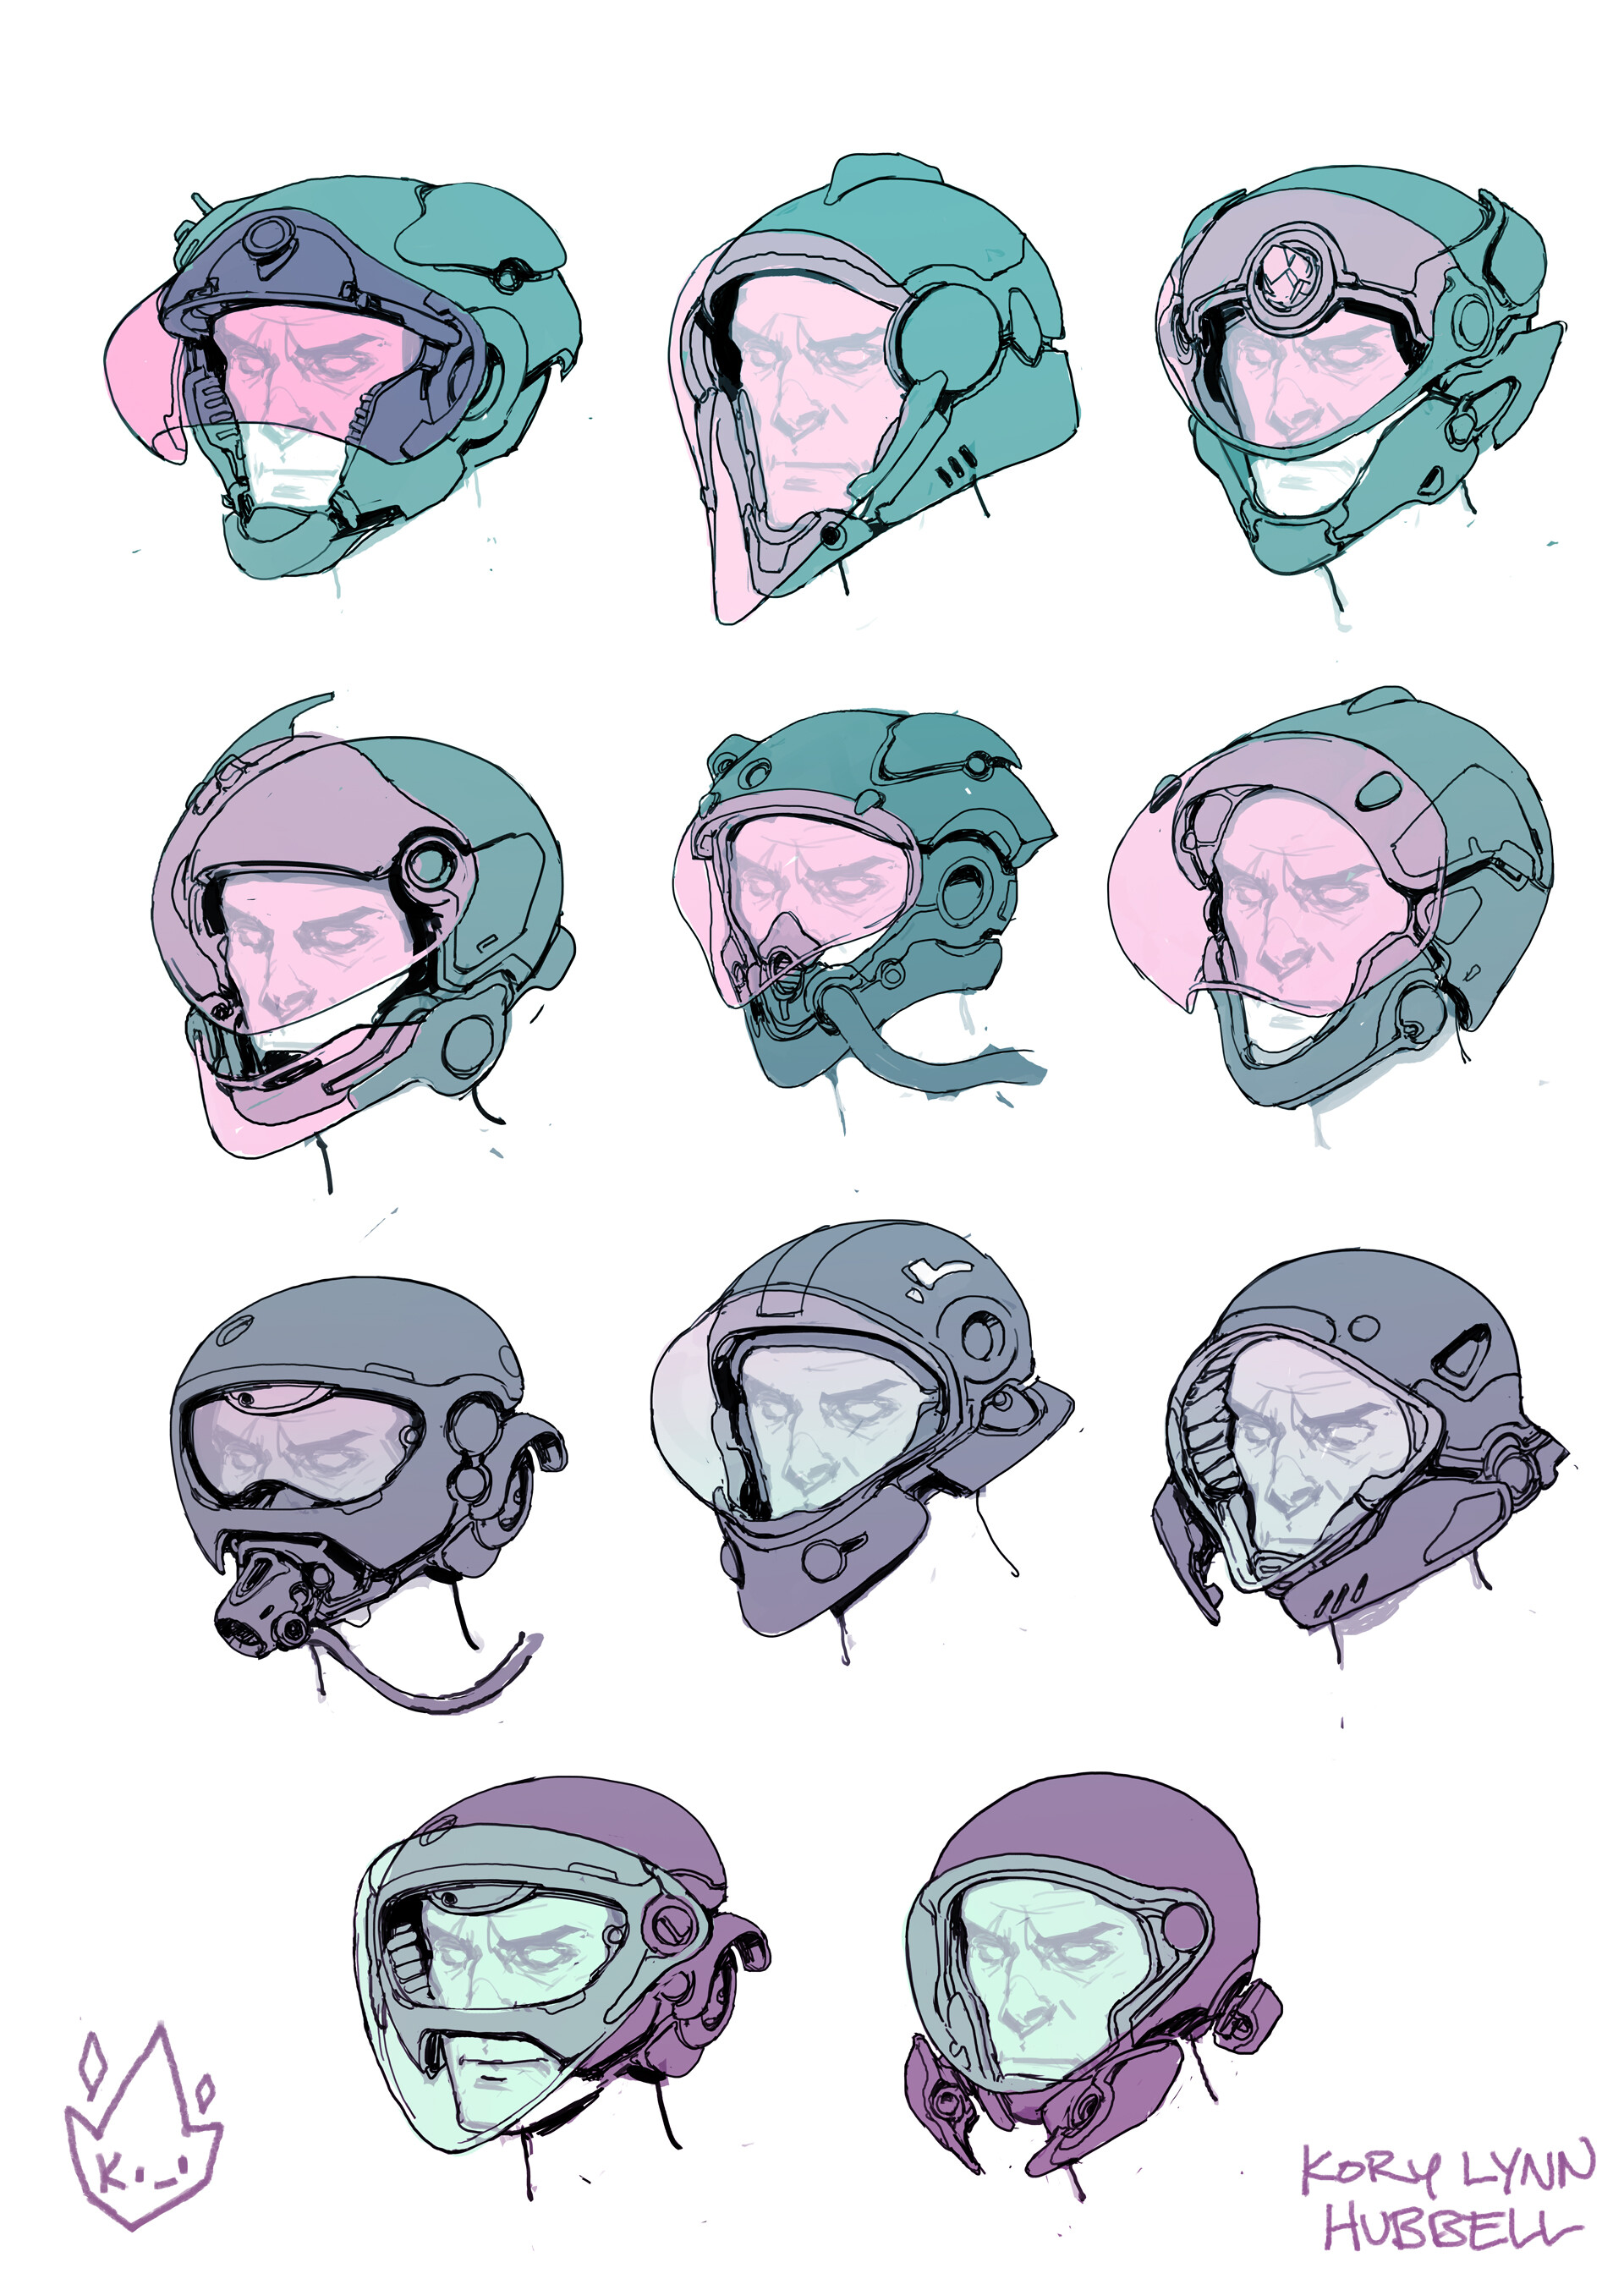 Kory lynn hubbell helmets color